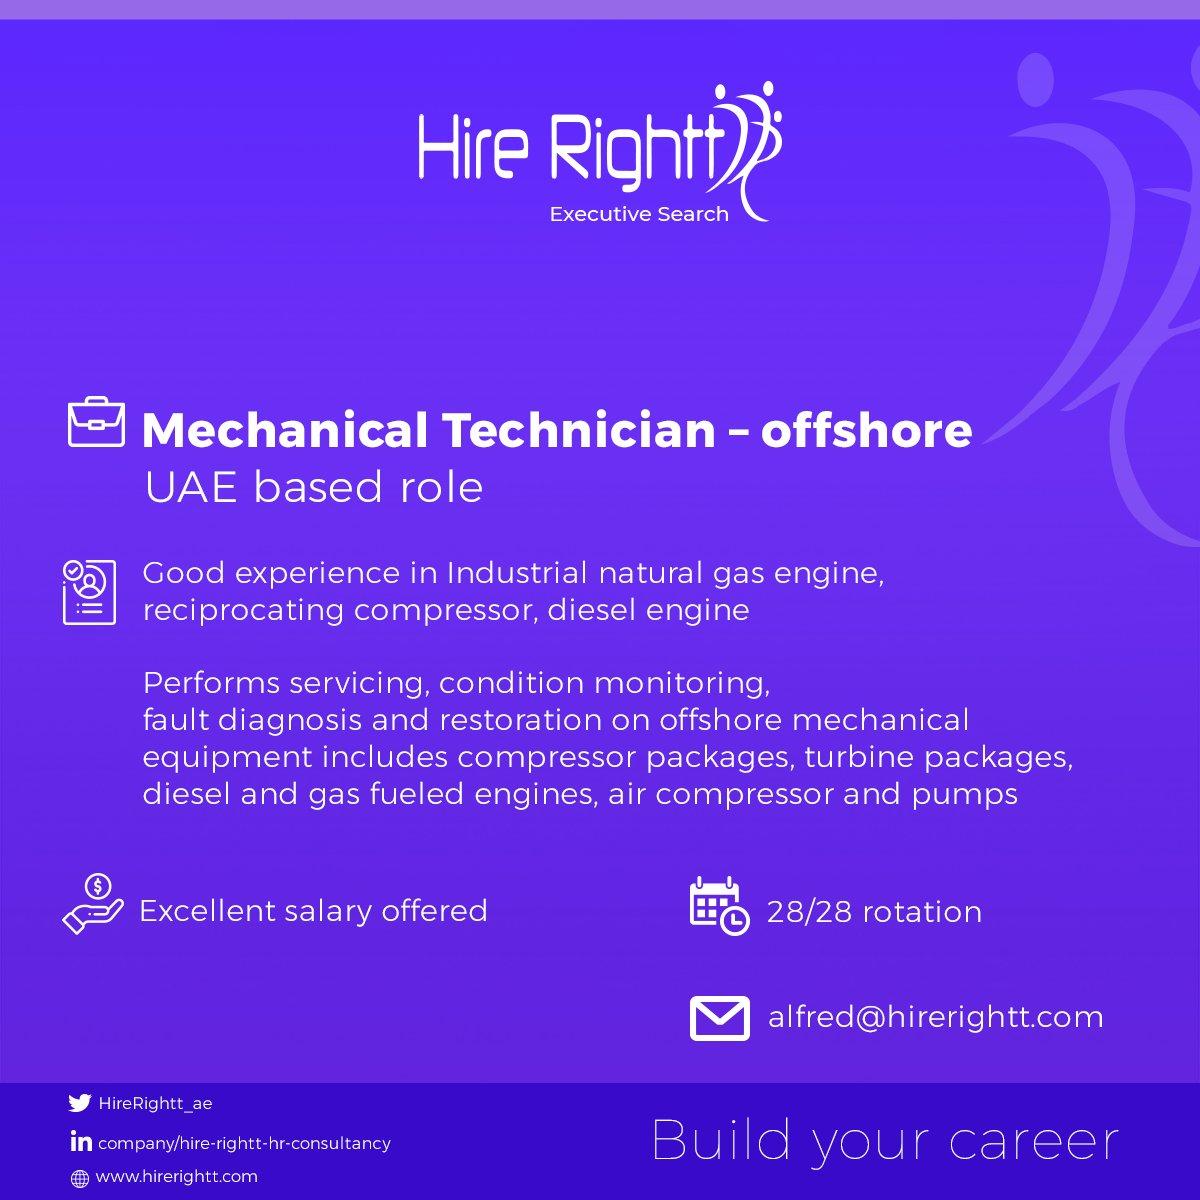 hire_rightt hashtag on Twitter